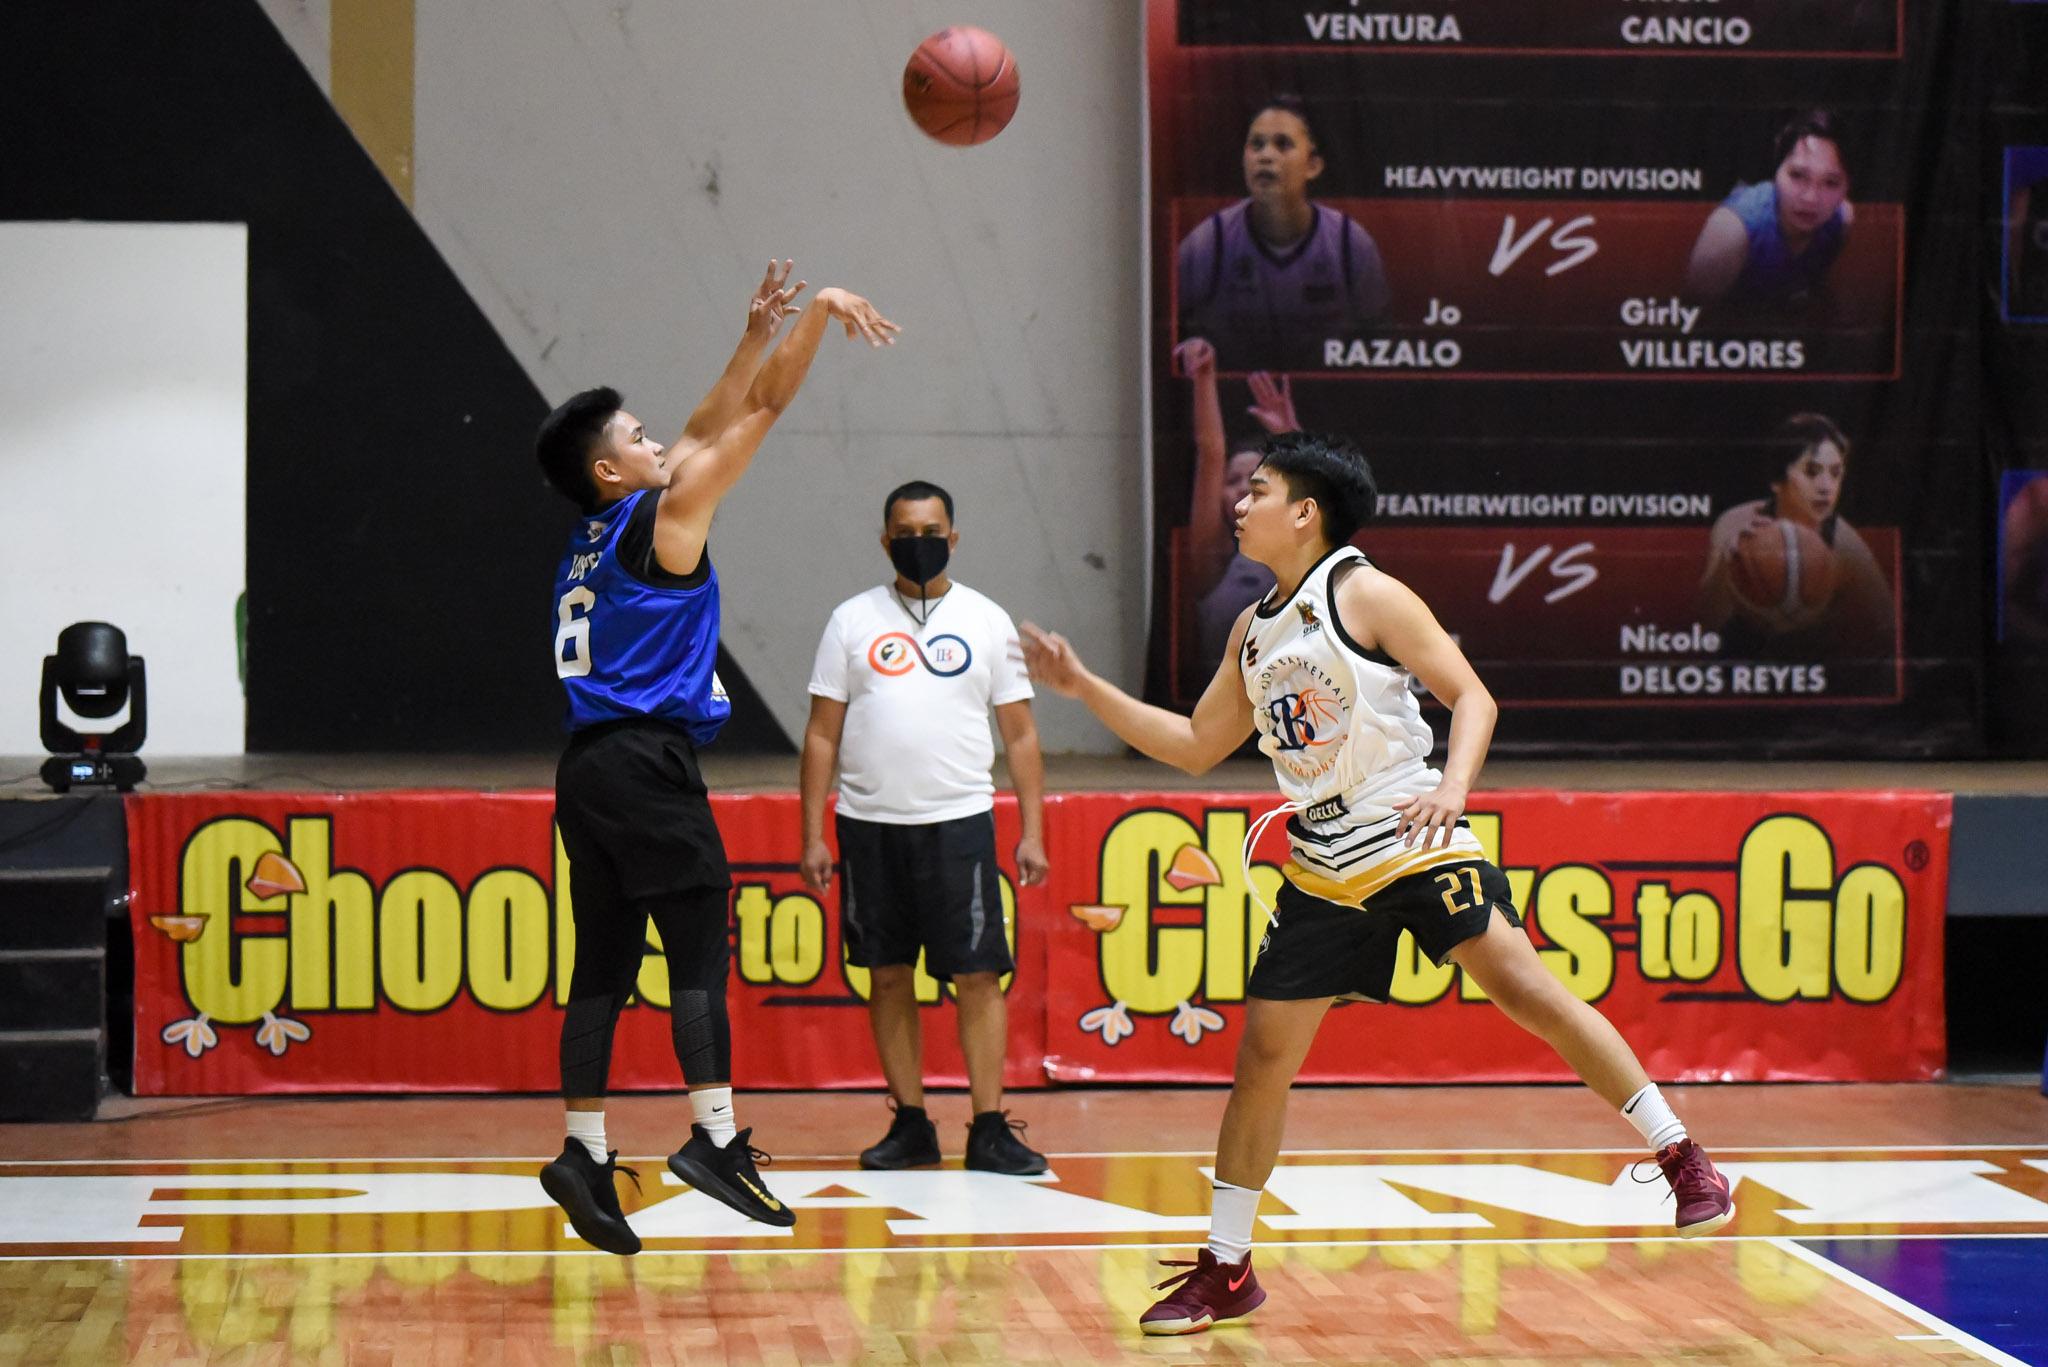 NBL-IBC-1v1-Games_Men-Featherweight_Lagrama Lim outlasts Penaranda as Paranaque Lady Aces dominate NBL-WNBL 1v1 1-on-1 NBL News  - philippine sports news